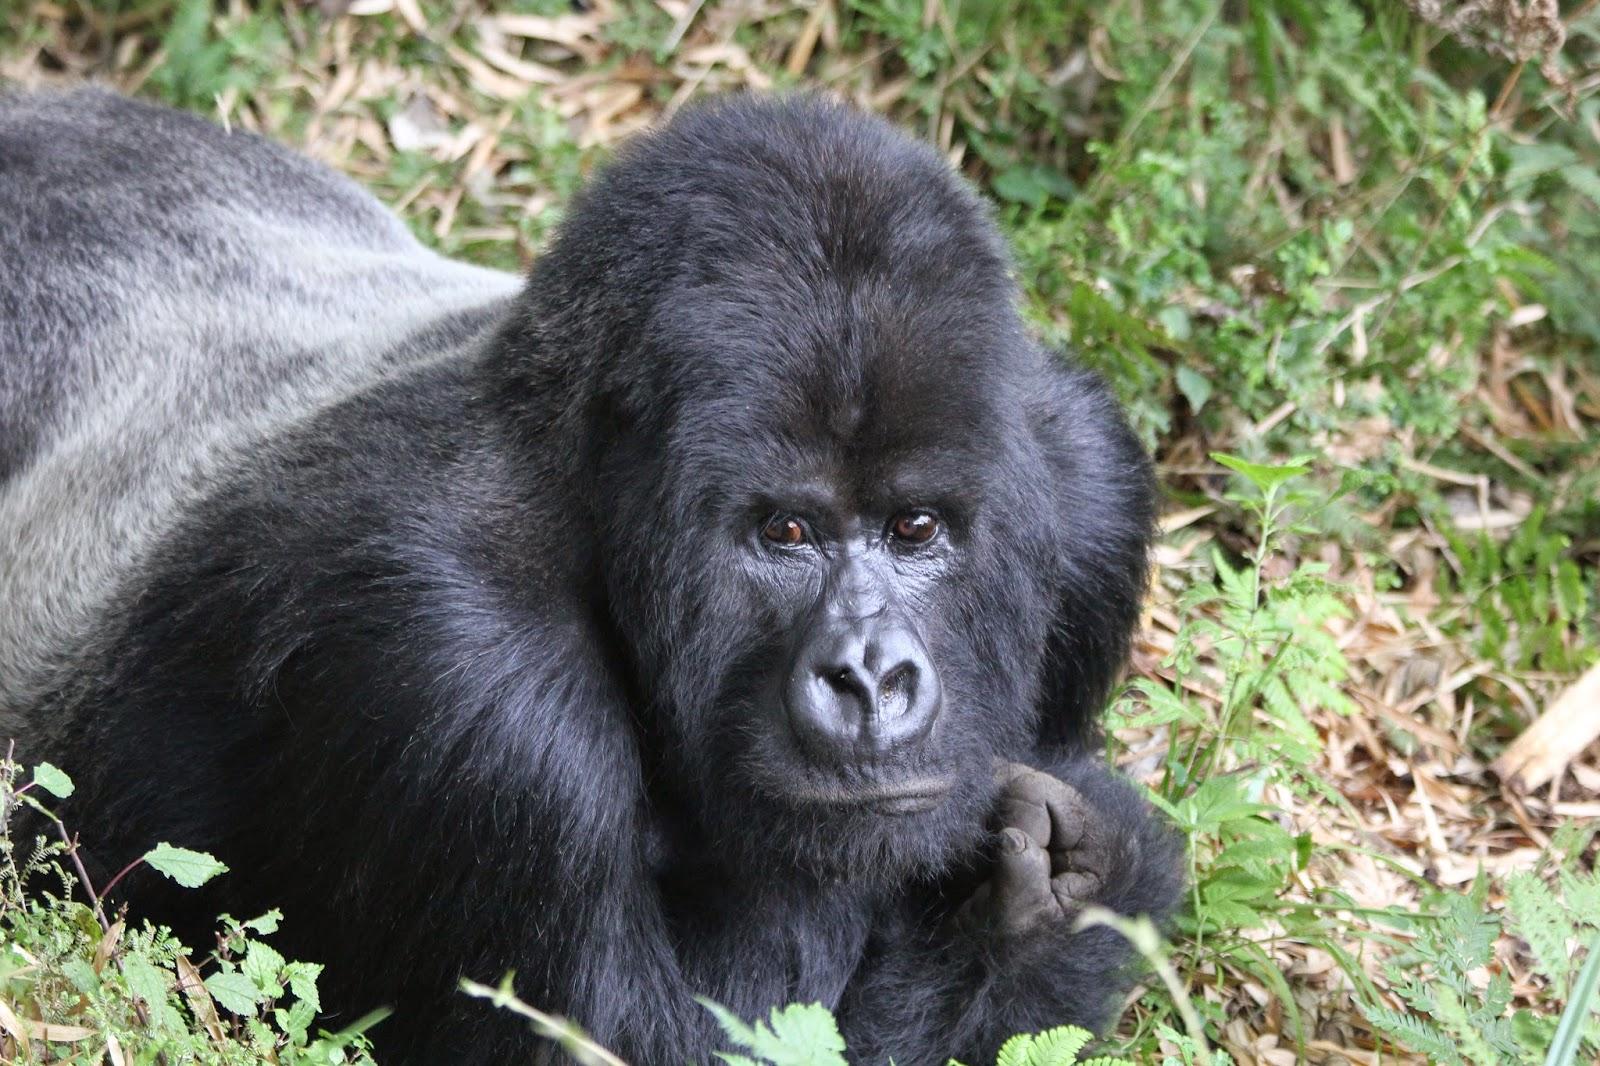 Guhonda, oldest Silverback mountain gorilla in Rwanda